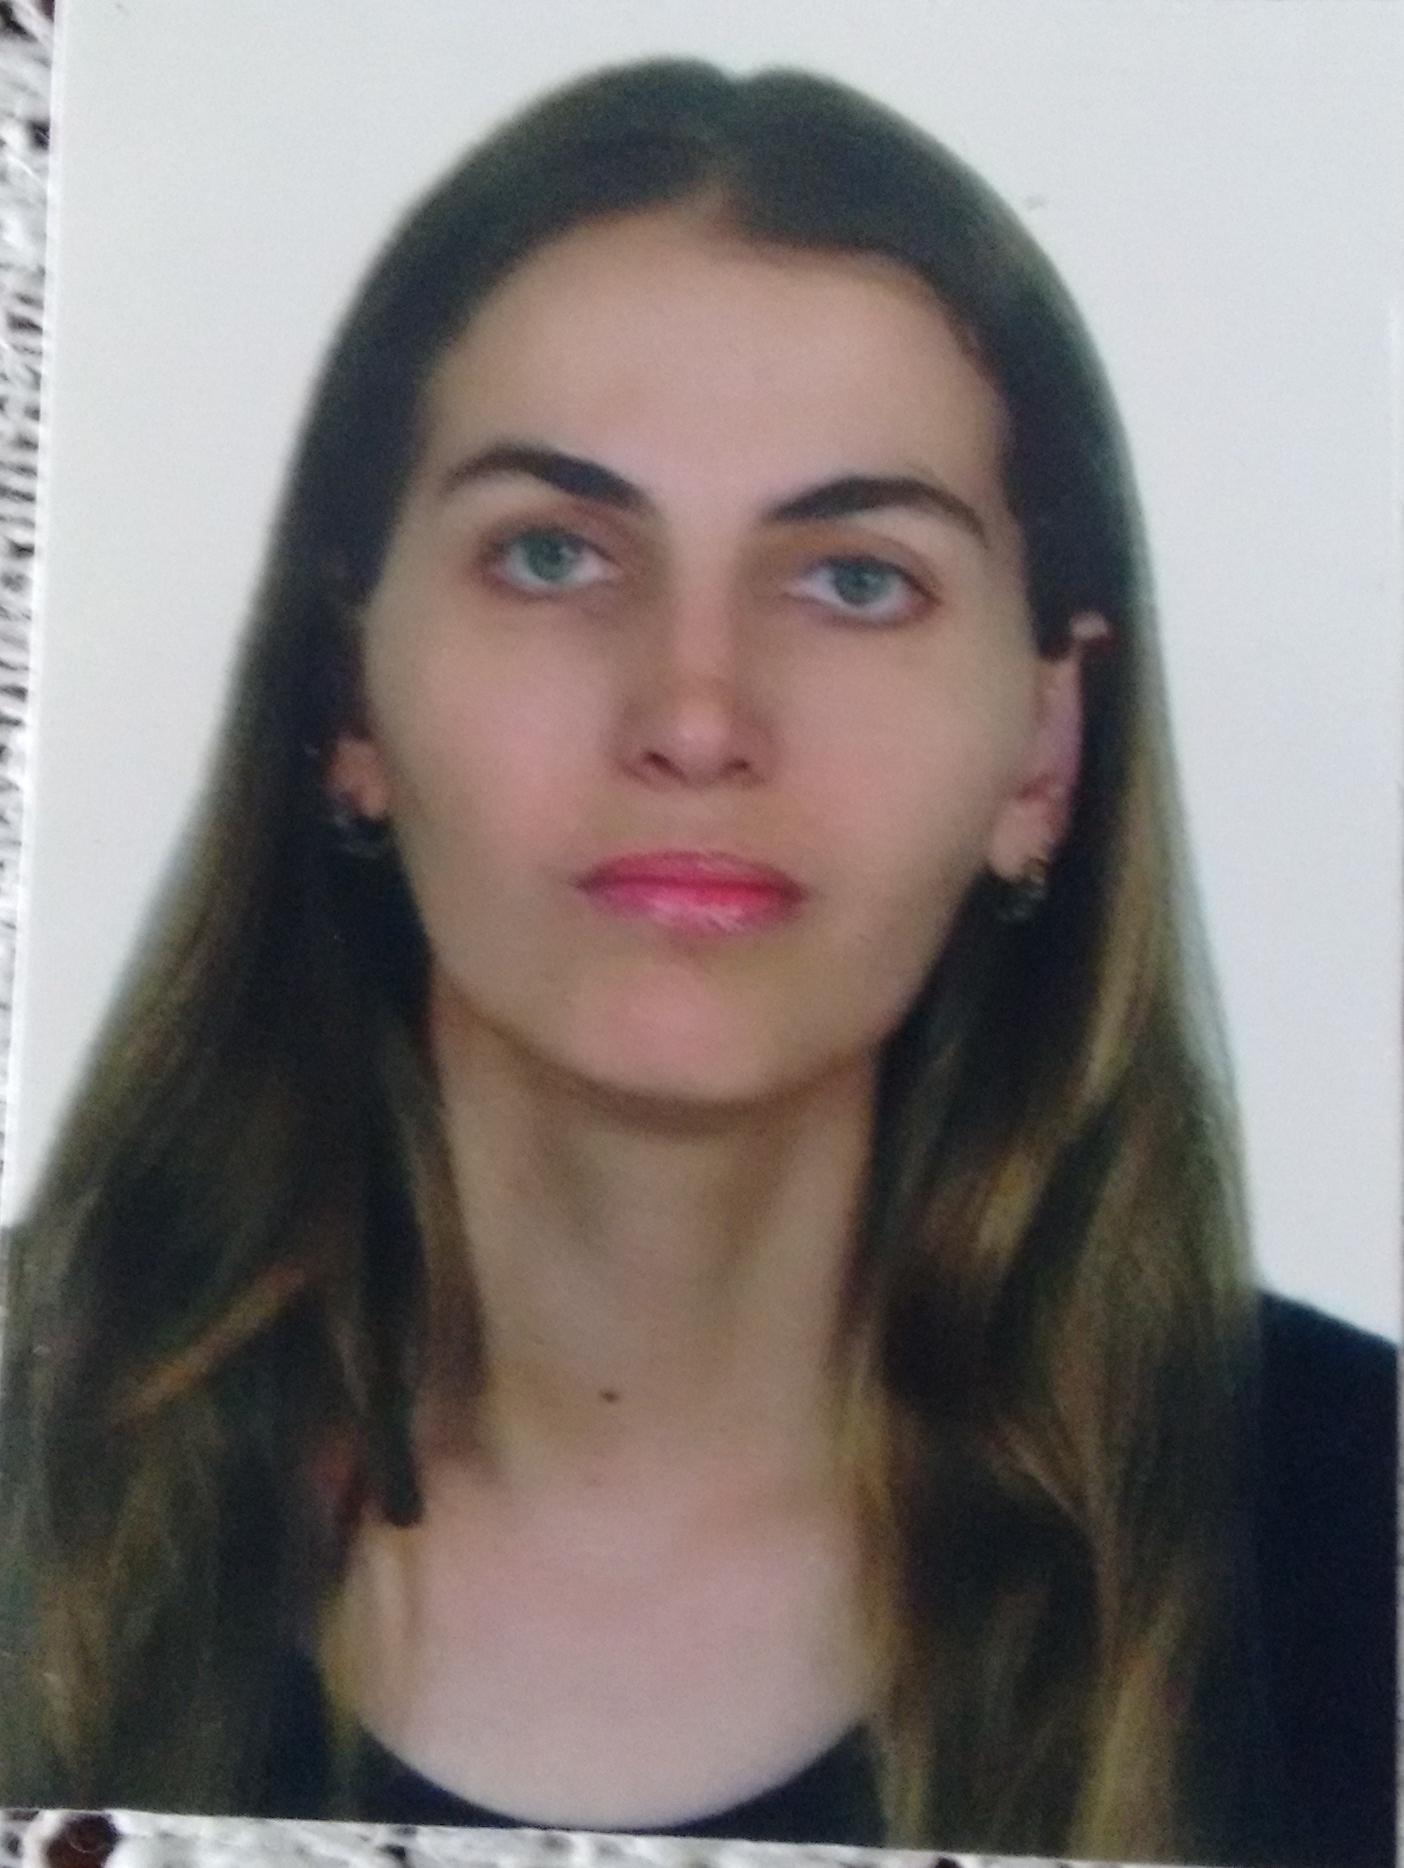 juliana mara varejão gobbi mateus